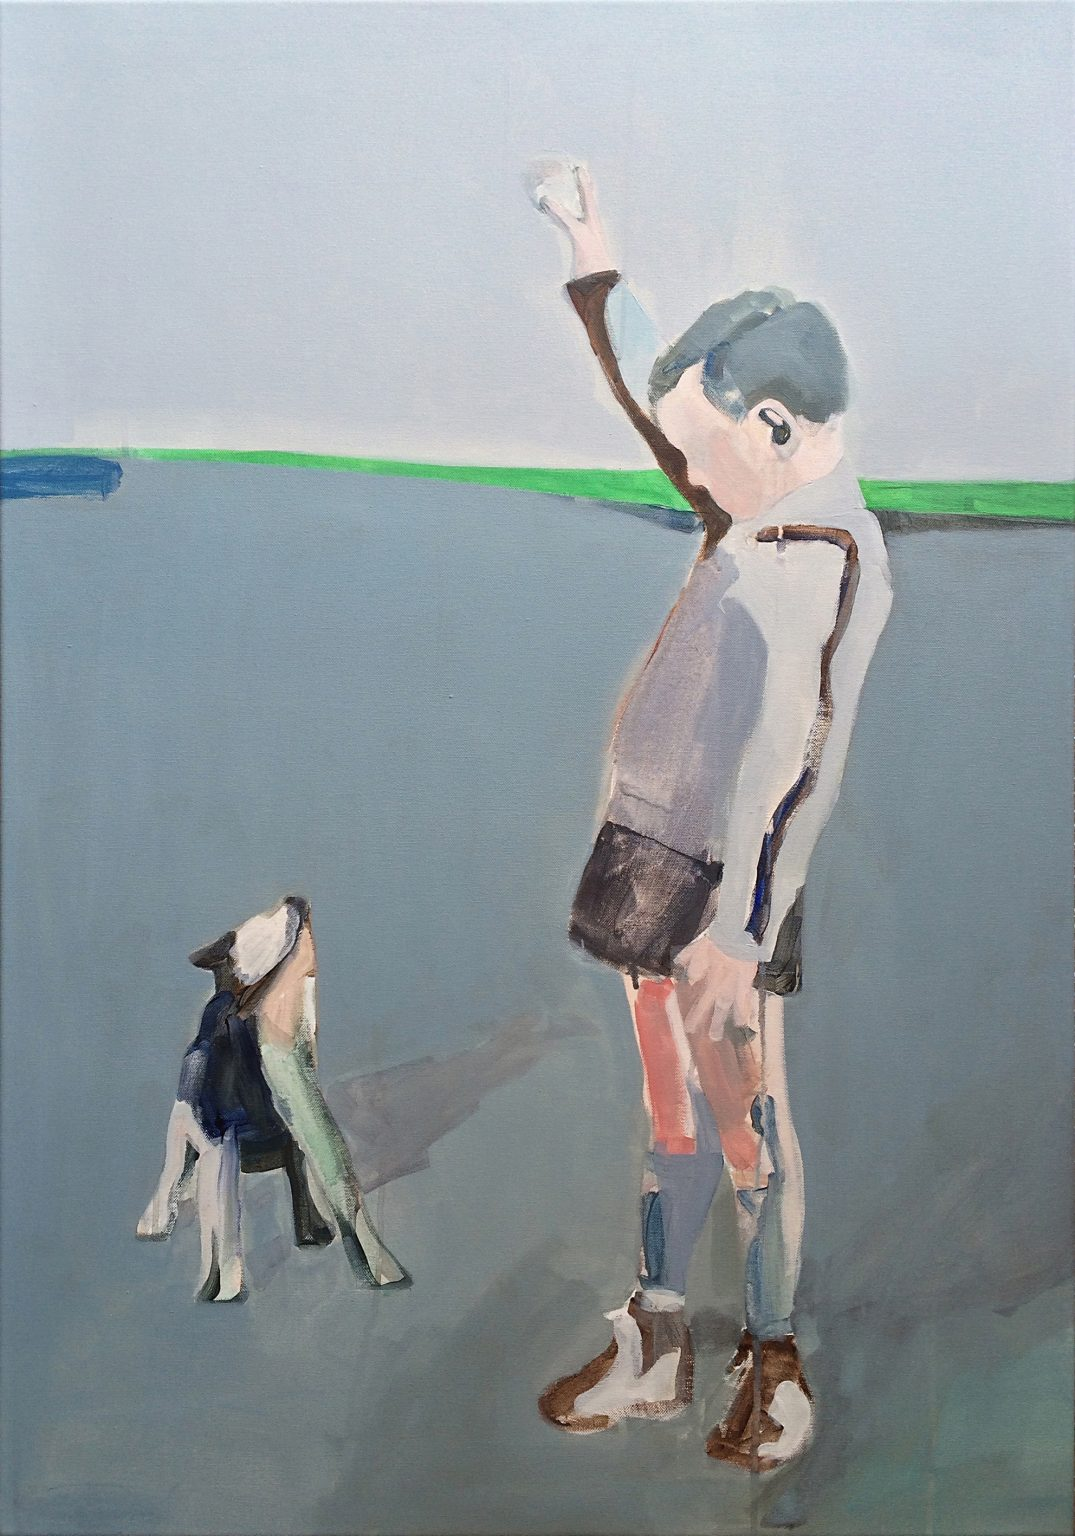 Boy 100 x 70 cm acrylics on canvas #SOLD